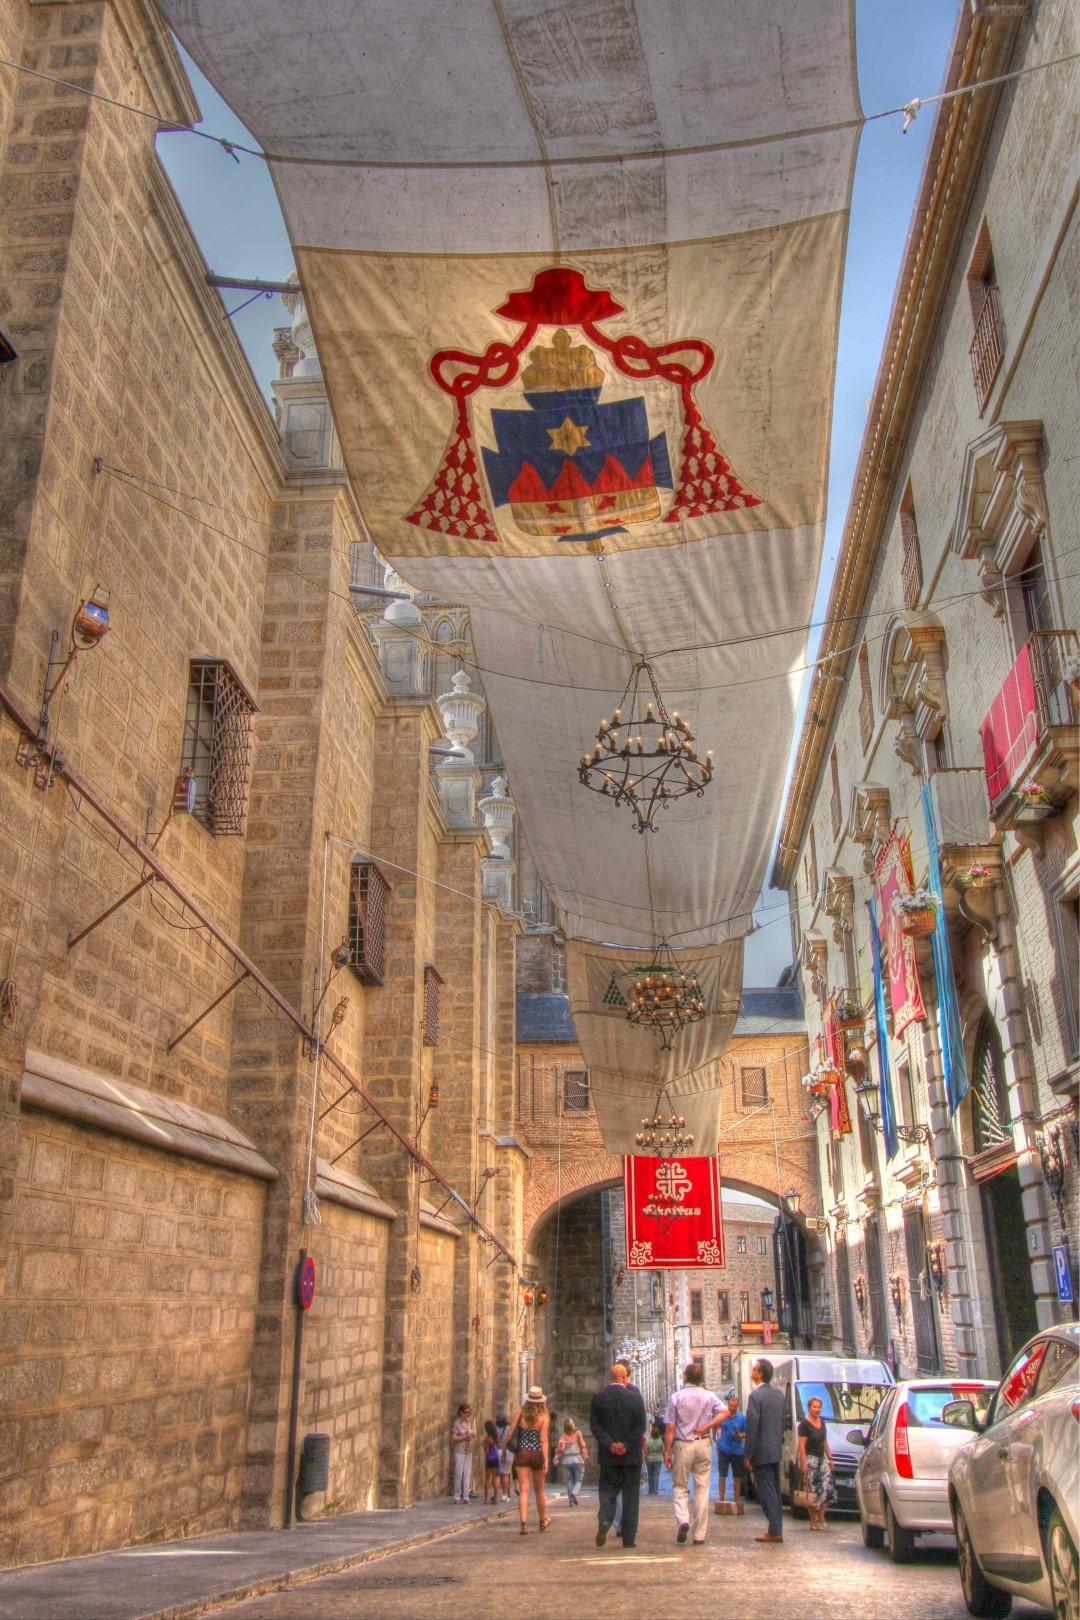 Corpus Christi, Toledo, Spain, Travelers Roundtable, Robert Bundy